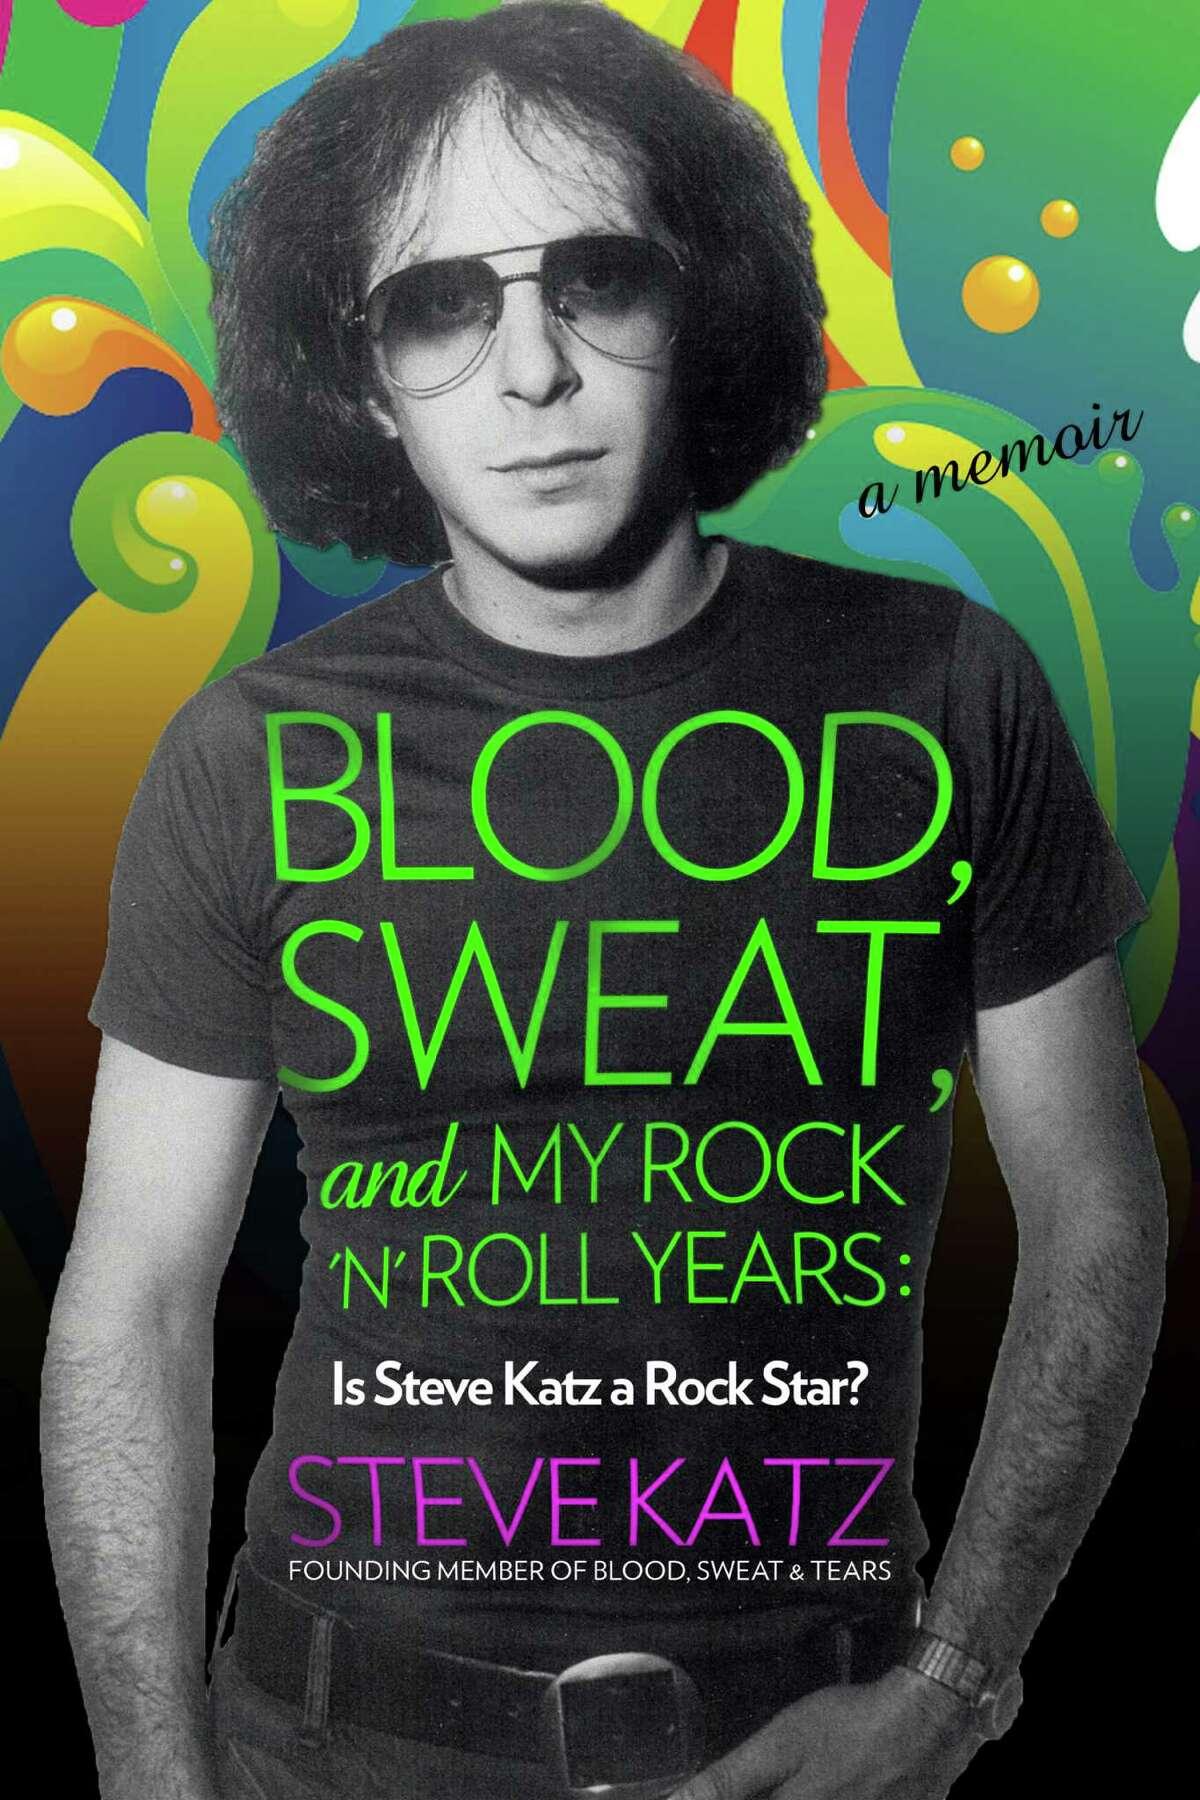 Steve Katz, a founding member of Blood, Sweat & Tears, has written a memoir about his life in music.